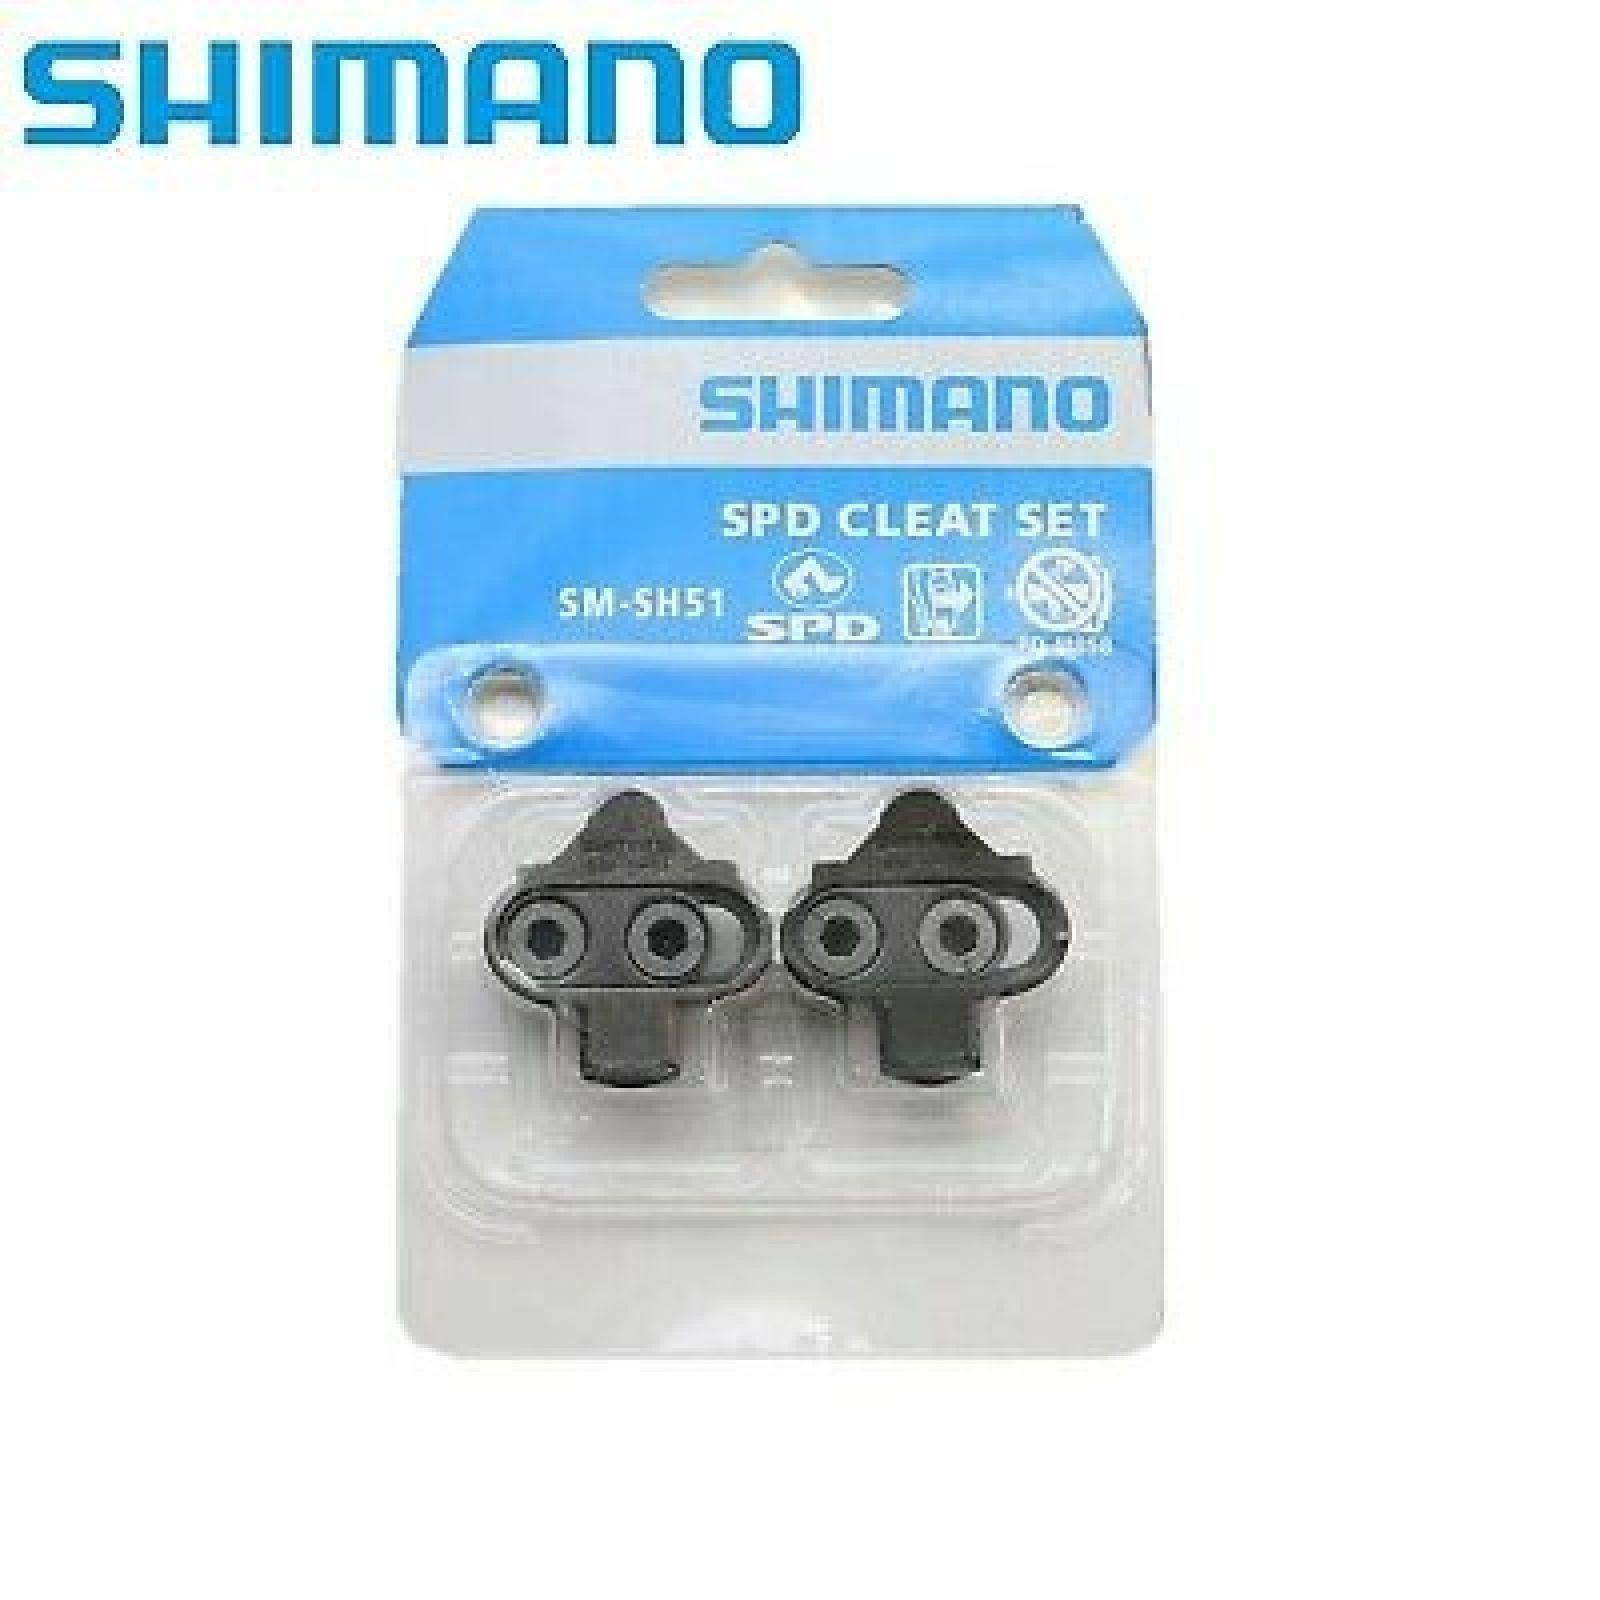 Шипы для педалей Shimano SM-SH51